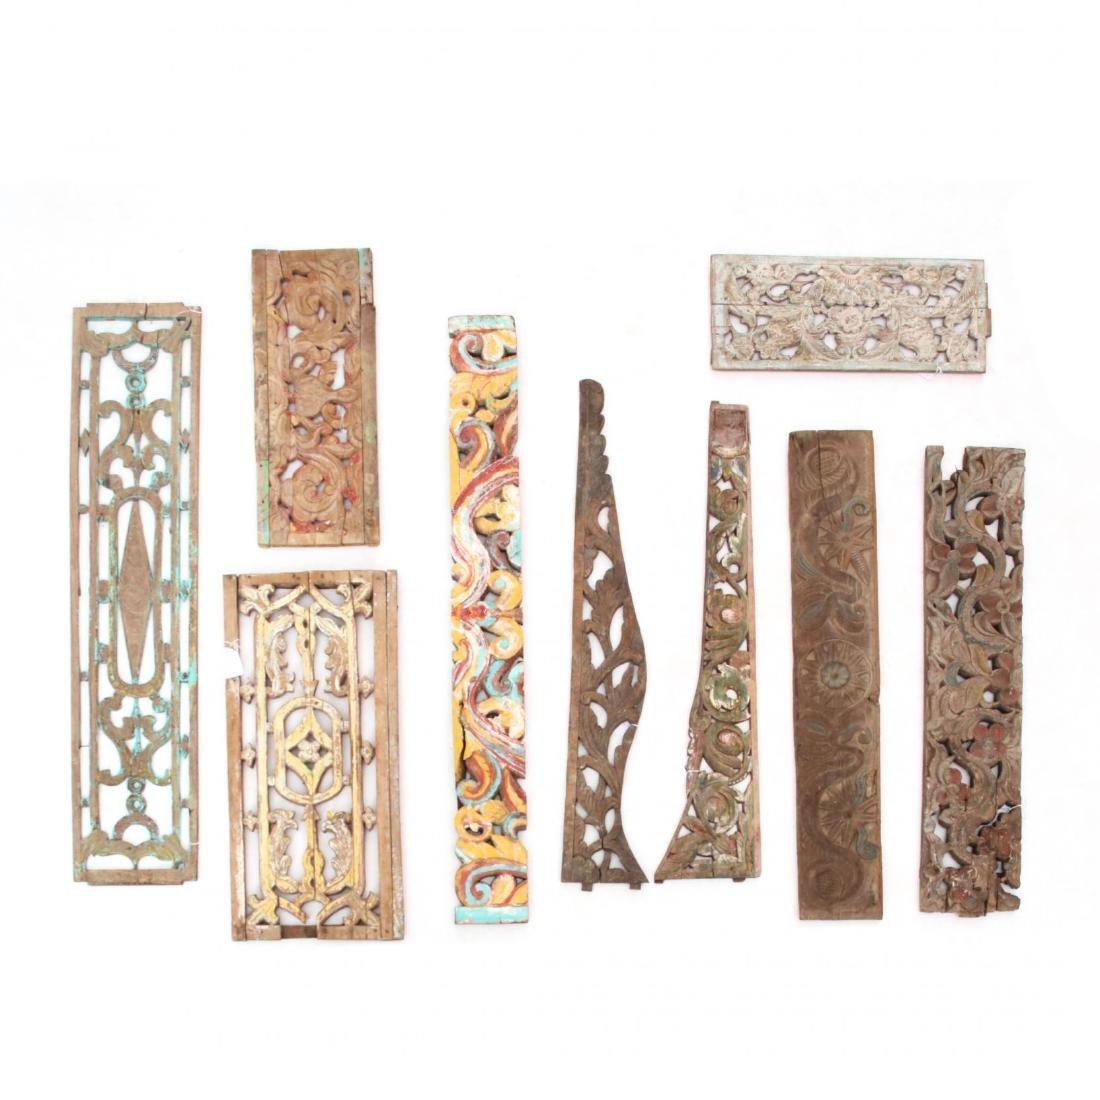 Nine Architectural Elements